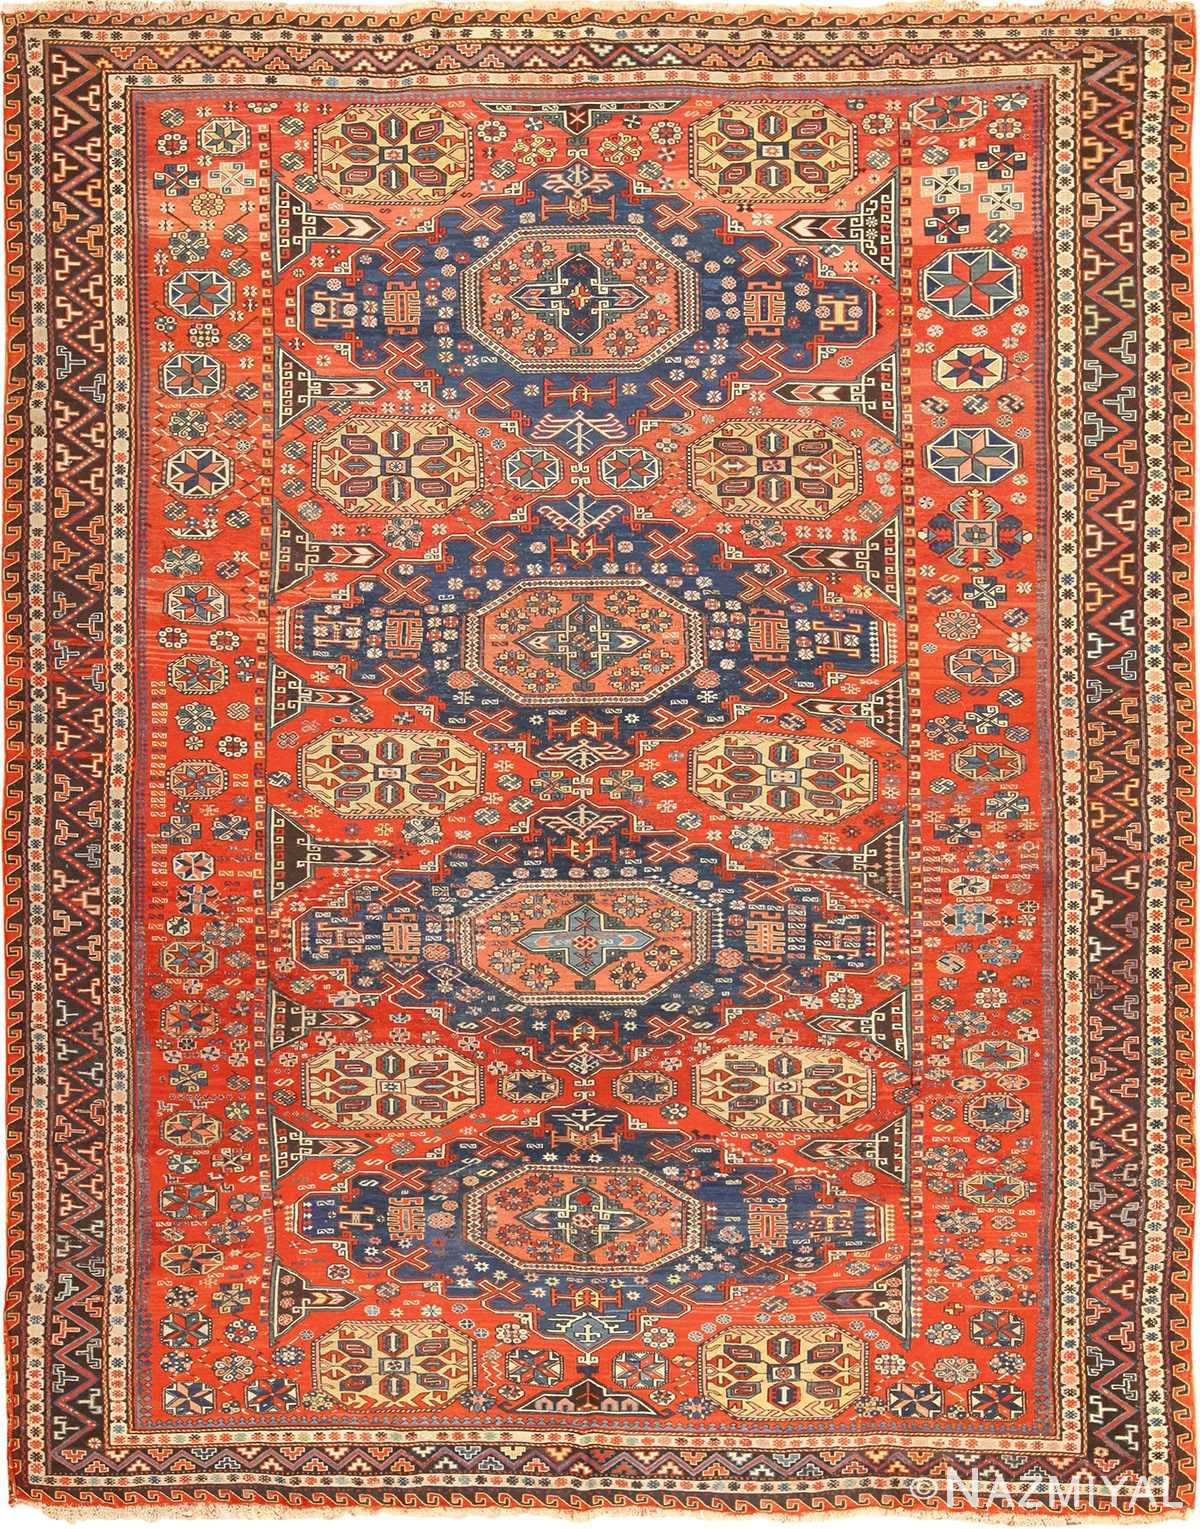 Beautiful Antique Soumak Caucasian Rug 49340 By Nazmiyal